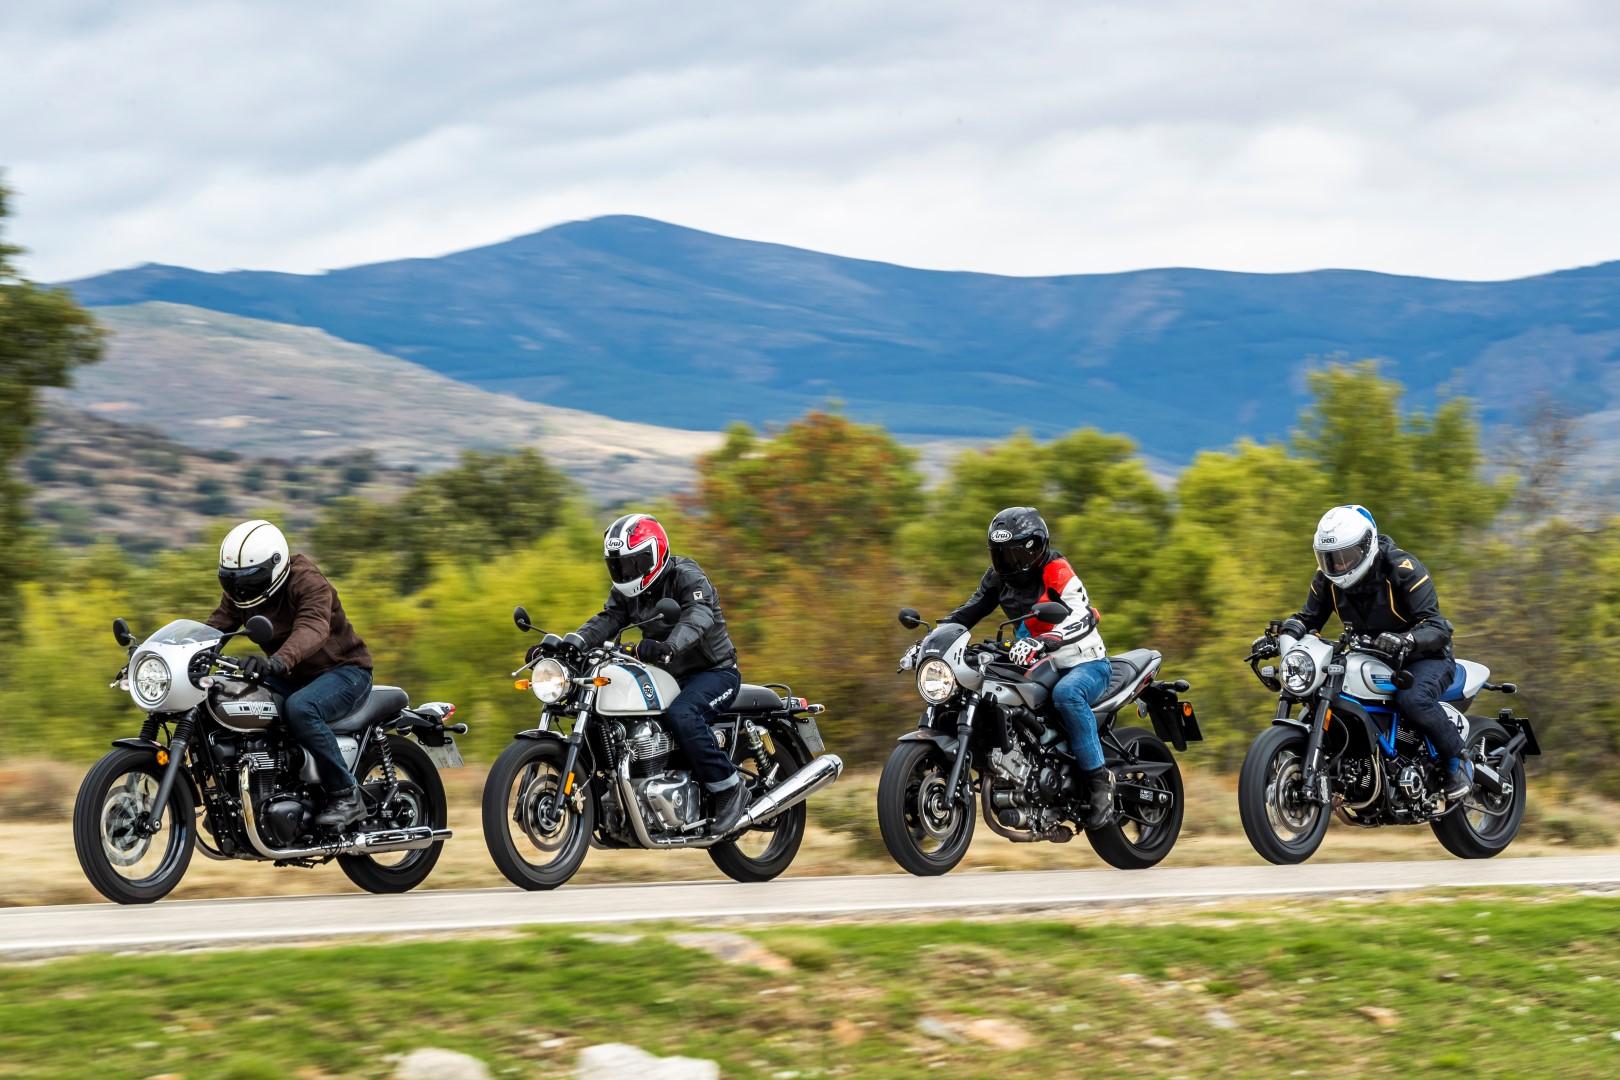 Comparativa Café Racer: Ducati Scrambler Café Racer, Kawasaki W800 Cafe, Royal Enfield Continental GT, Suzuki SV650X